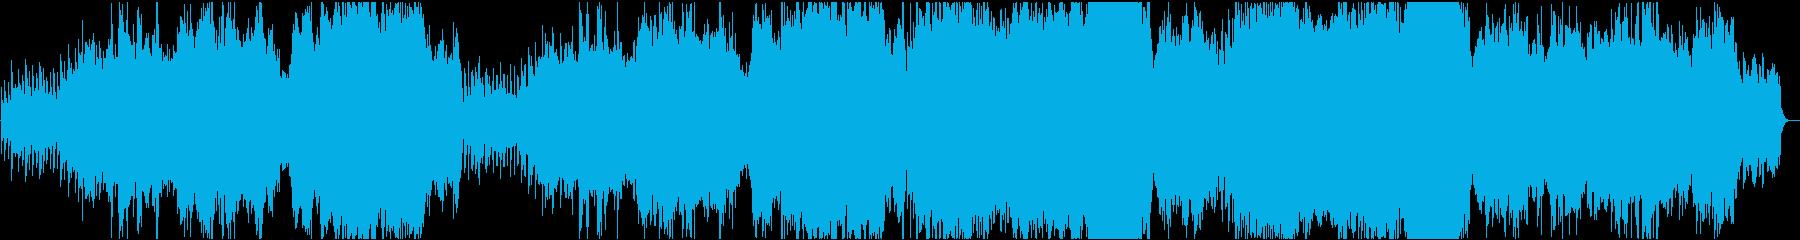 Vocaliseの再生済みの波形